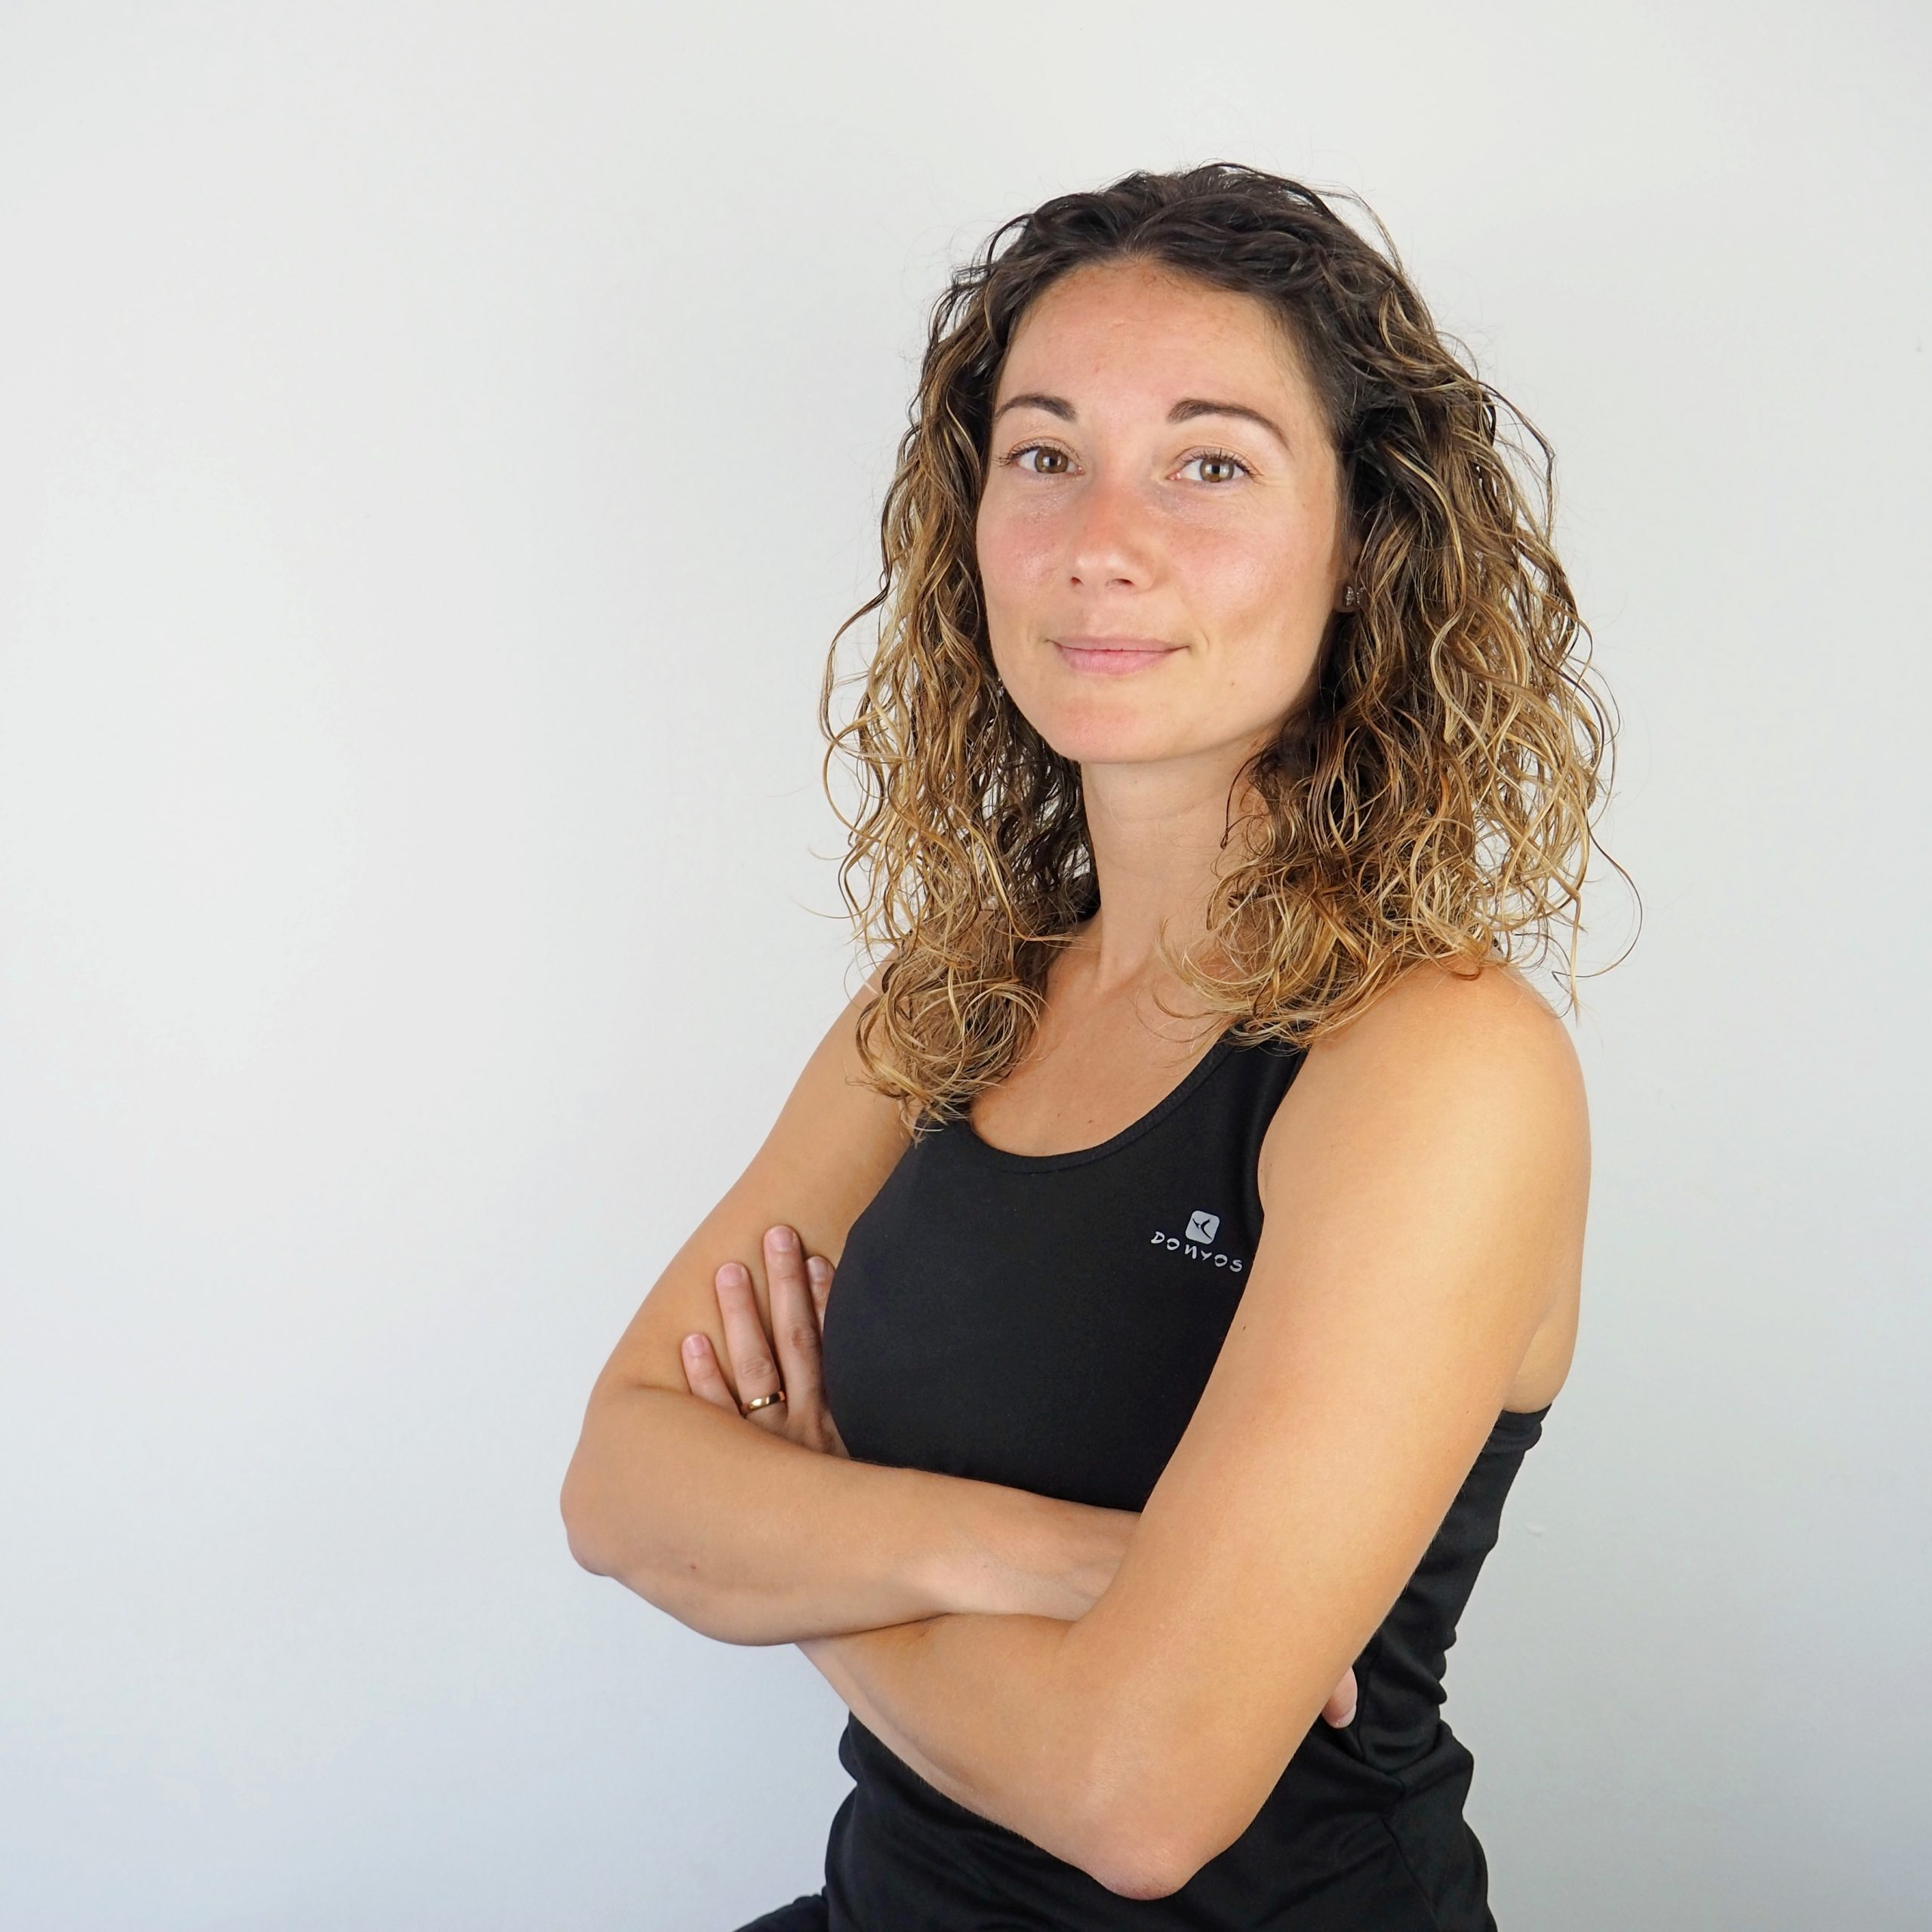 Alessandra Pentimalli